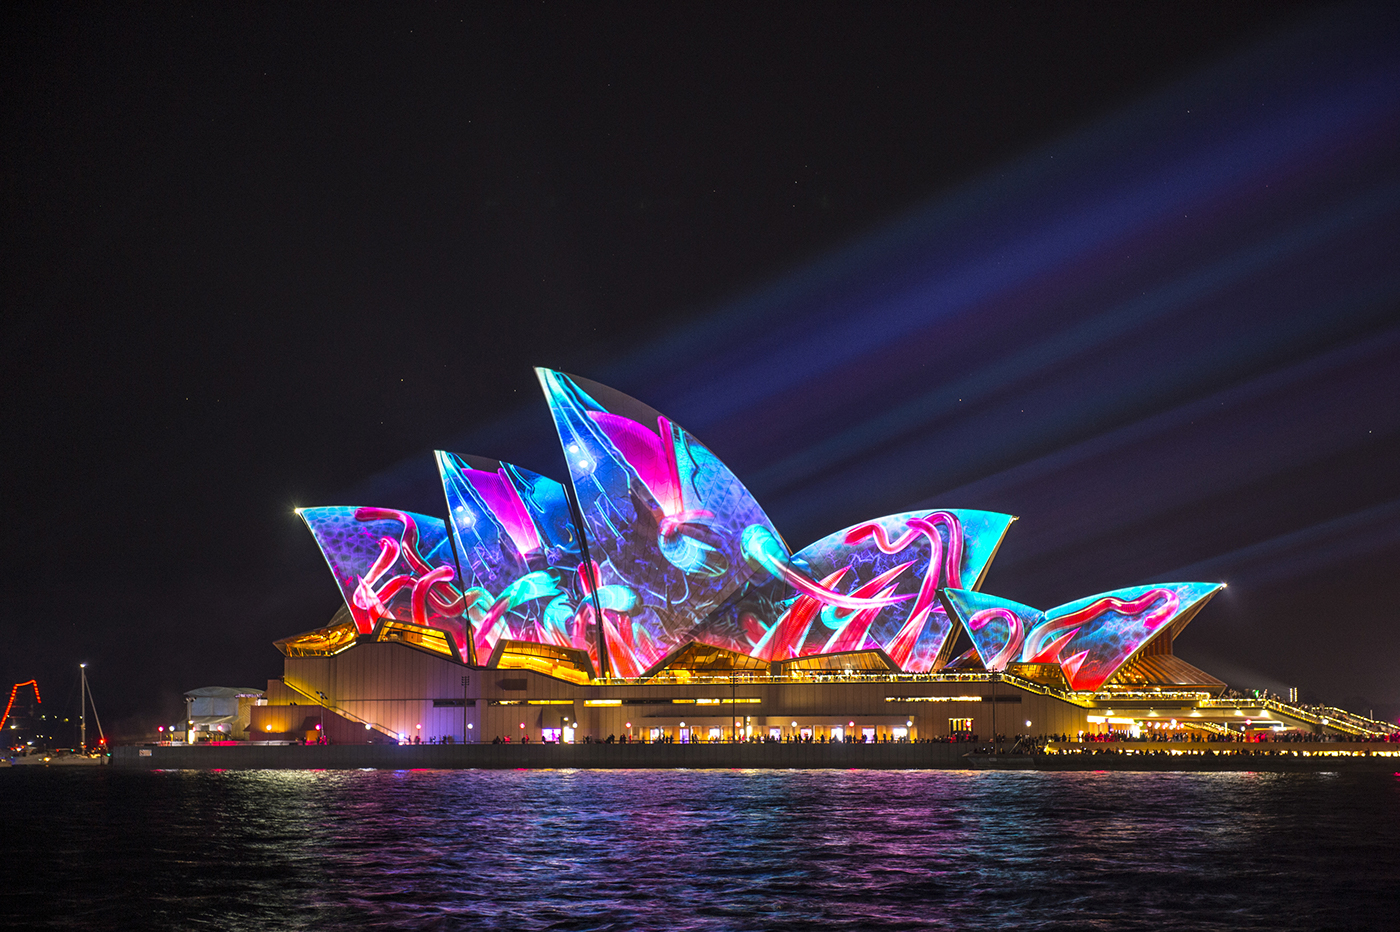 Sydney Opera House - Lighting The Sails on Behance